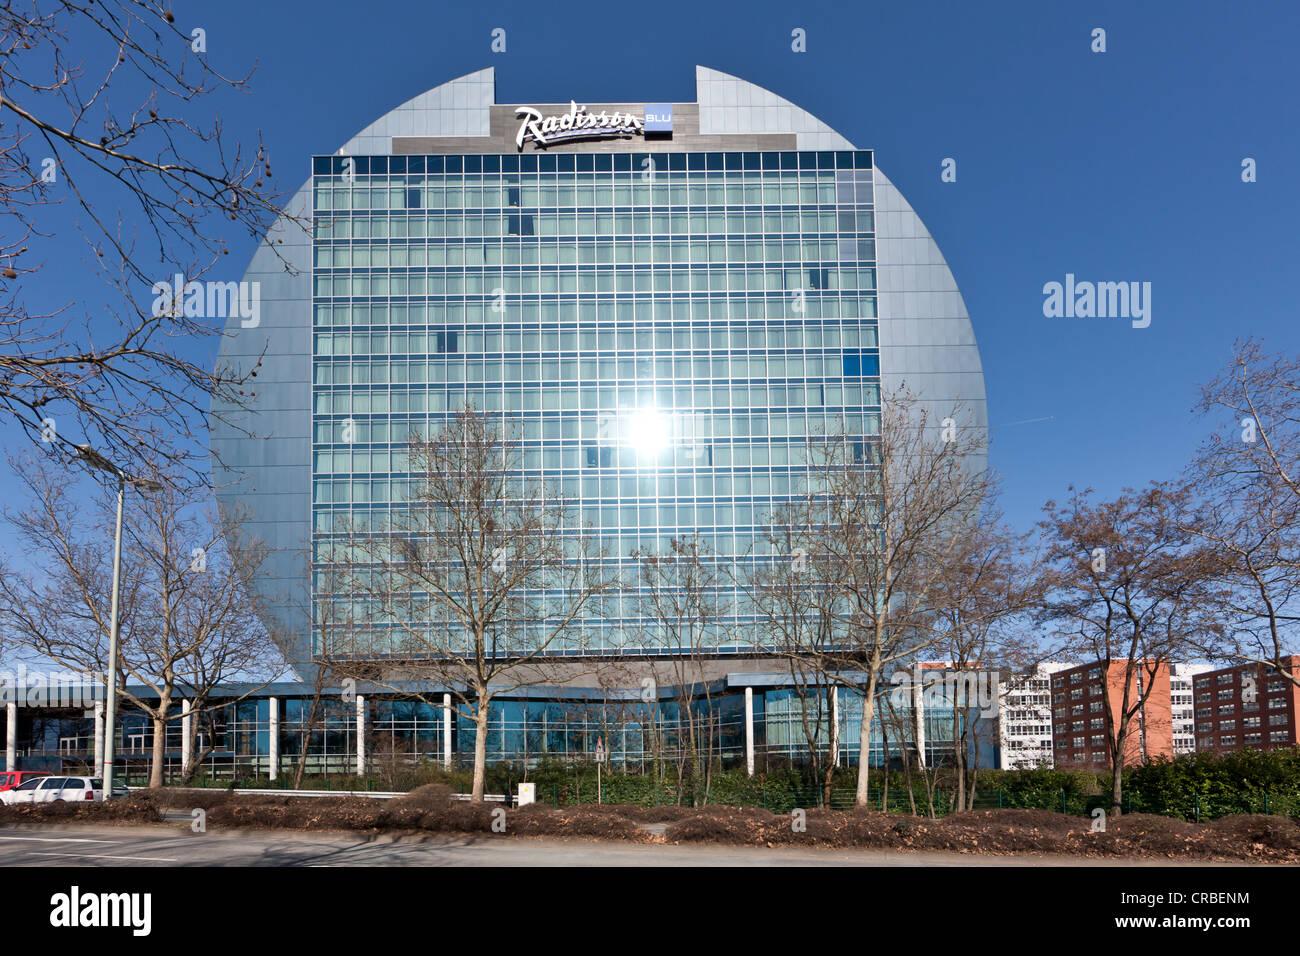 Radisson Blu Hotel, Frankfurt, Hesse, Germany, Europe - Stock Image